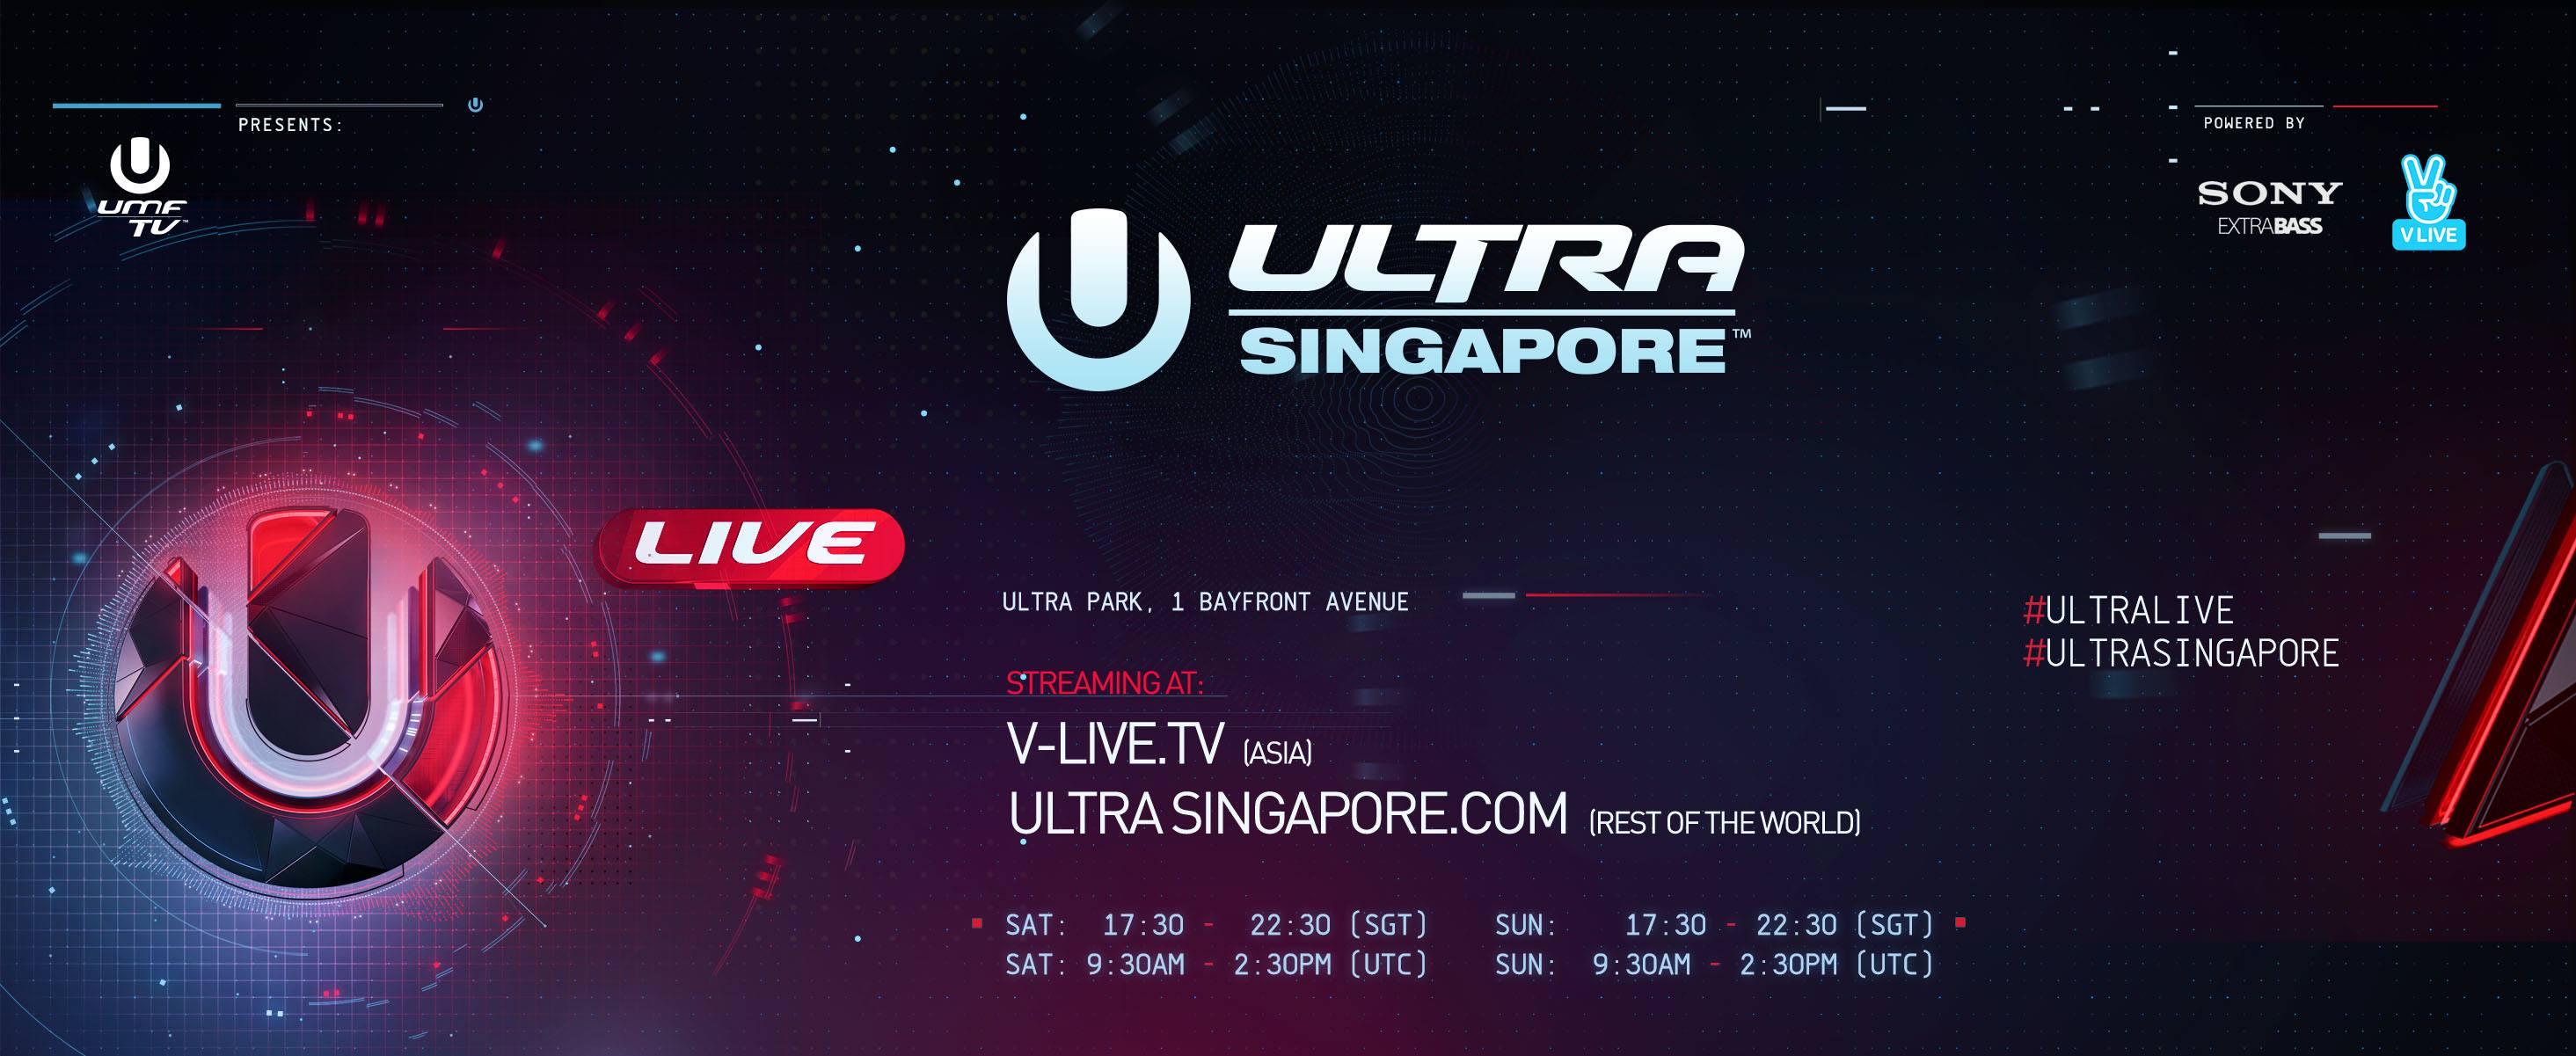 ultra-singapore-2016-live